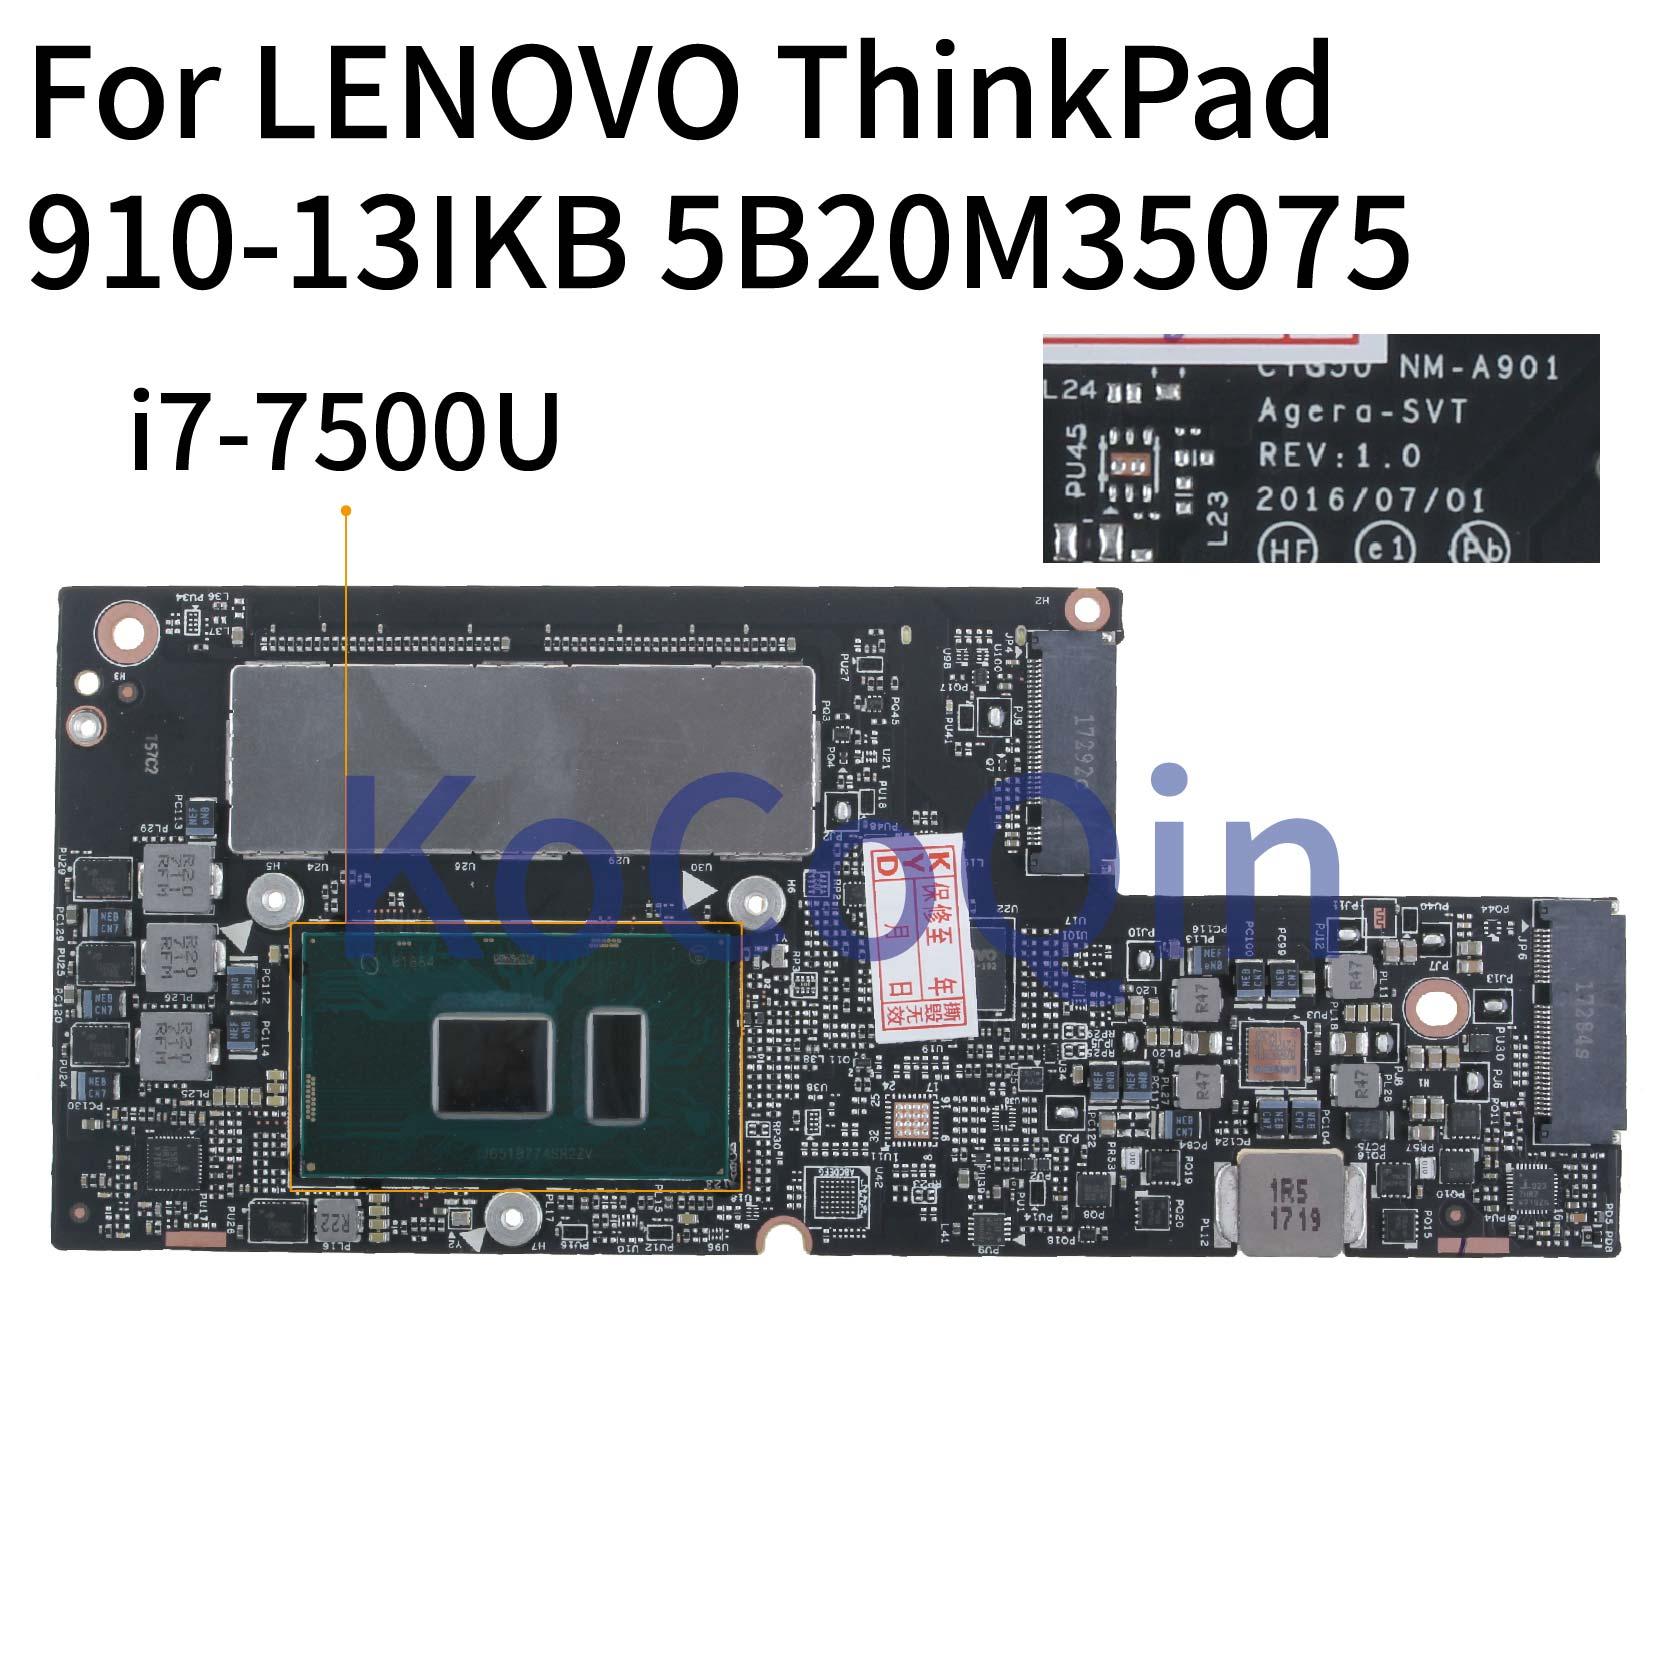 Placa base para ordenador portátil KoCoQin para LENOVO ThinkPad 910-13IKB I7-7500U 8G RAM   CYG50 NM-A901 SR2ZV